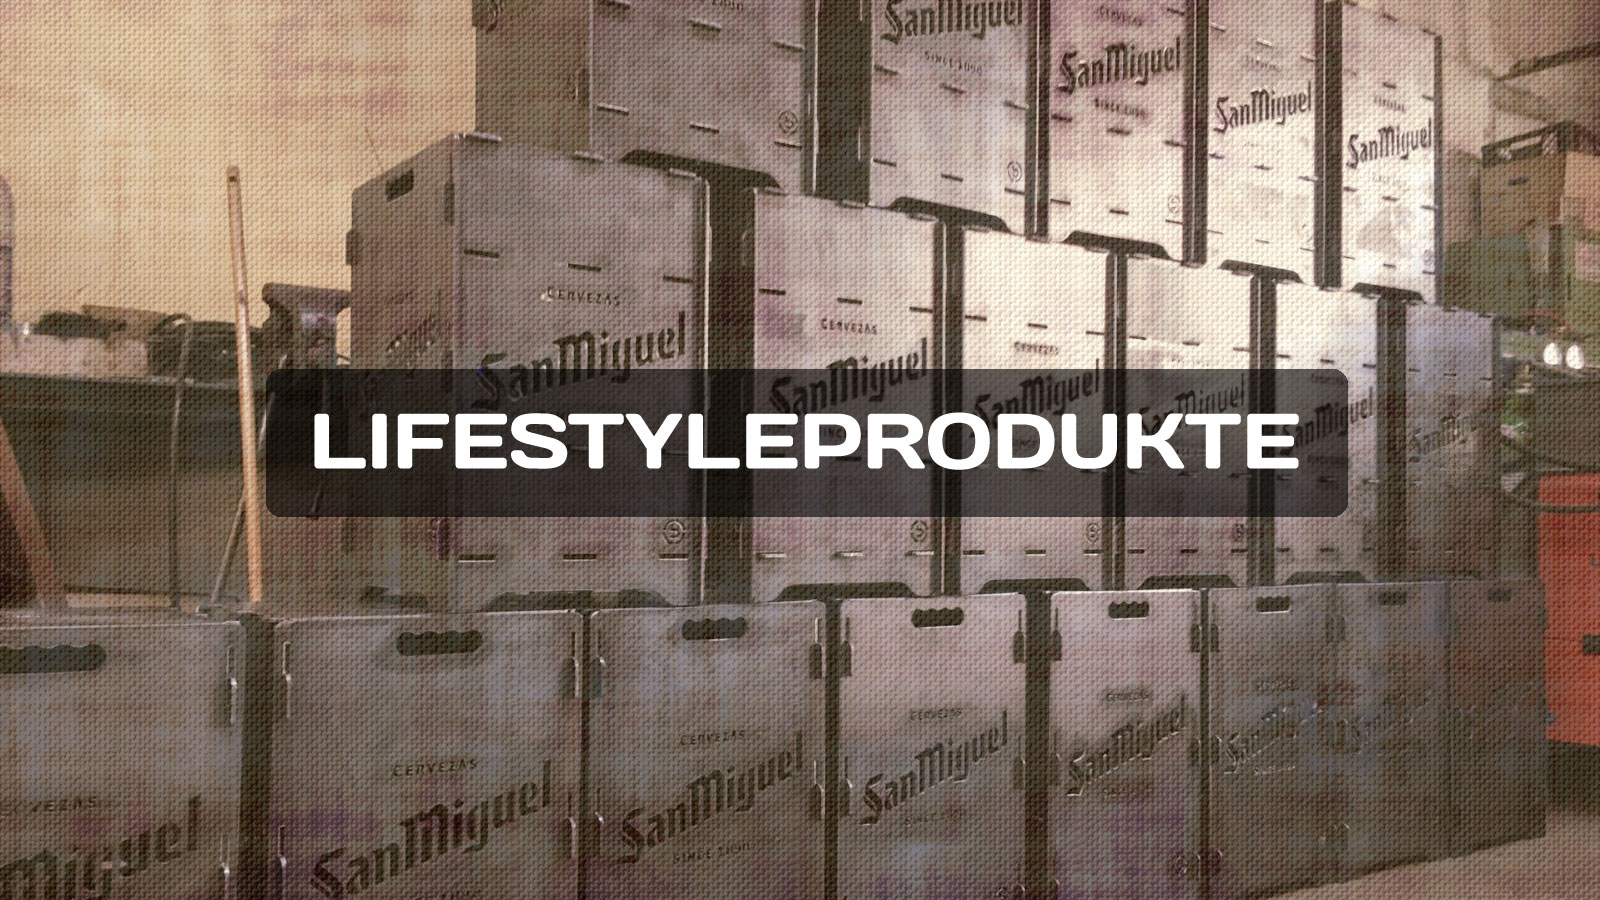 Lifestyleprodukte